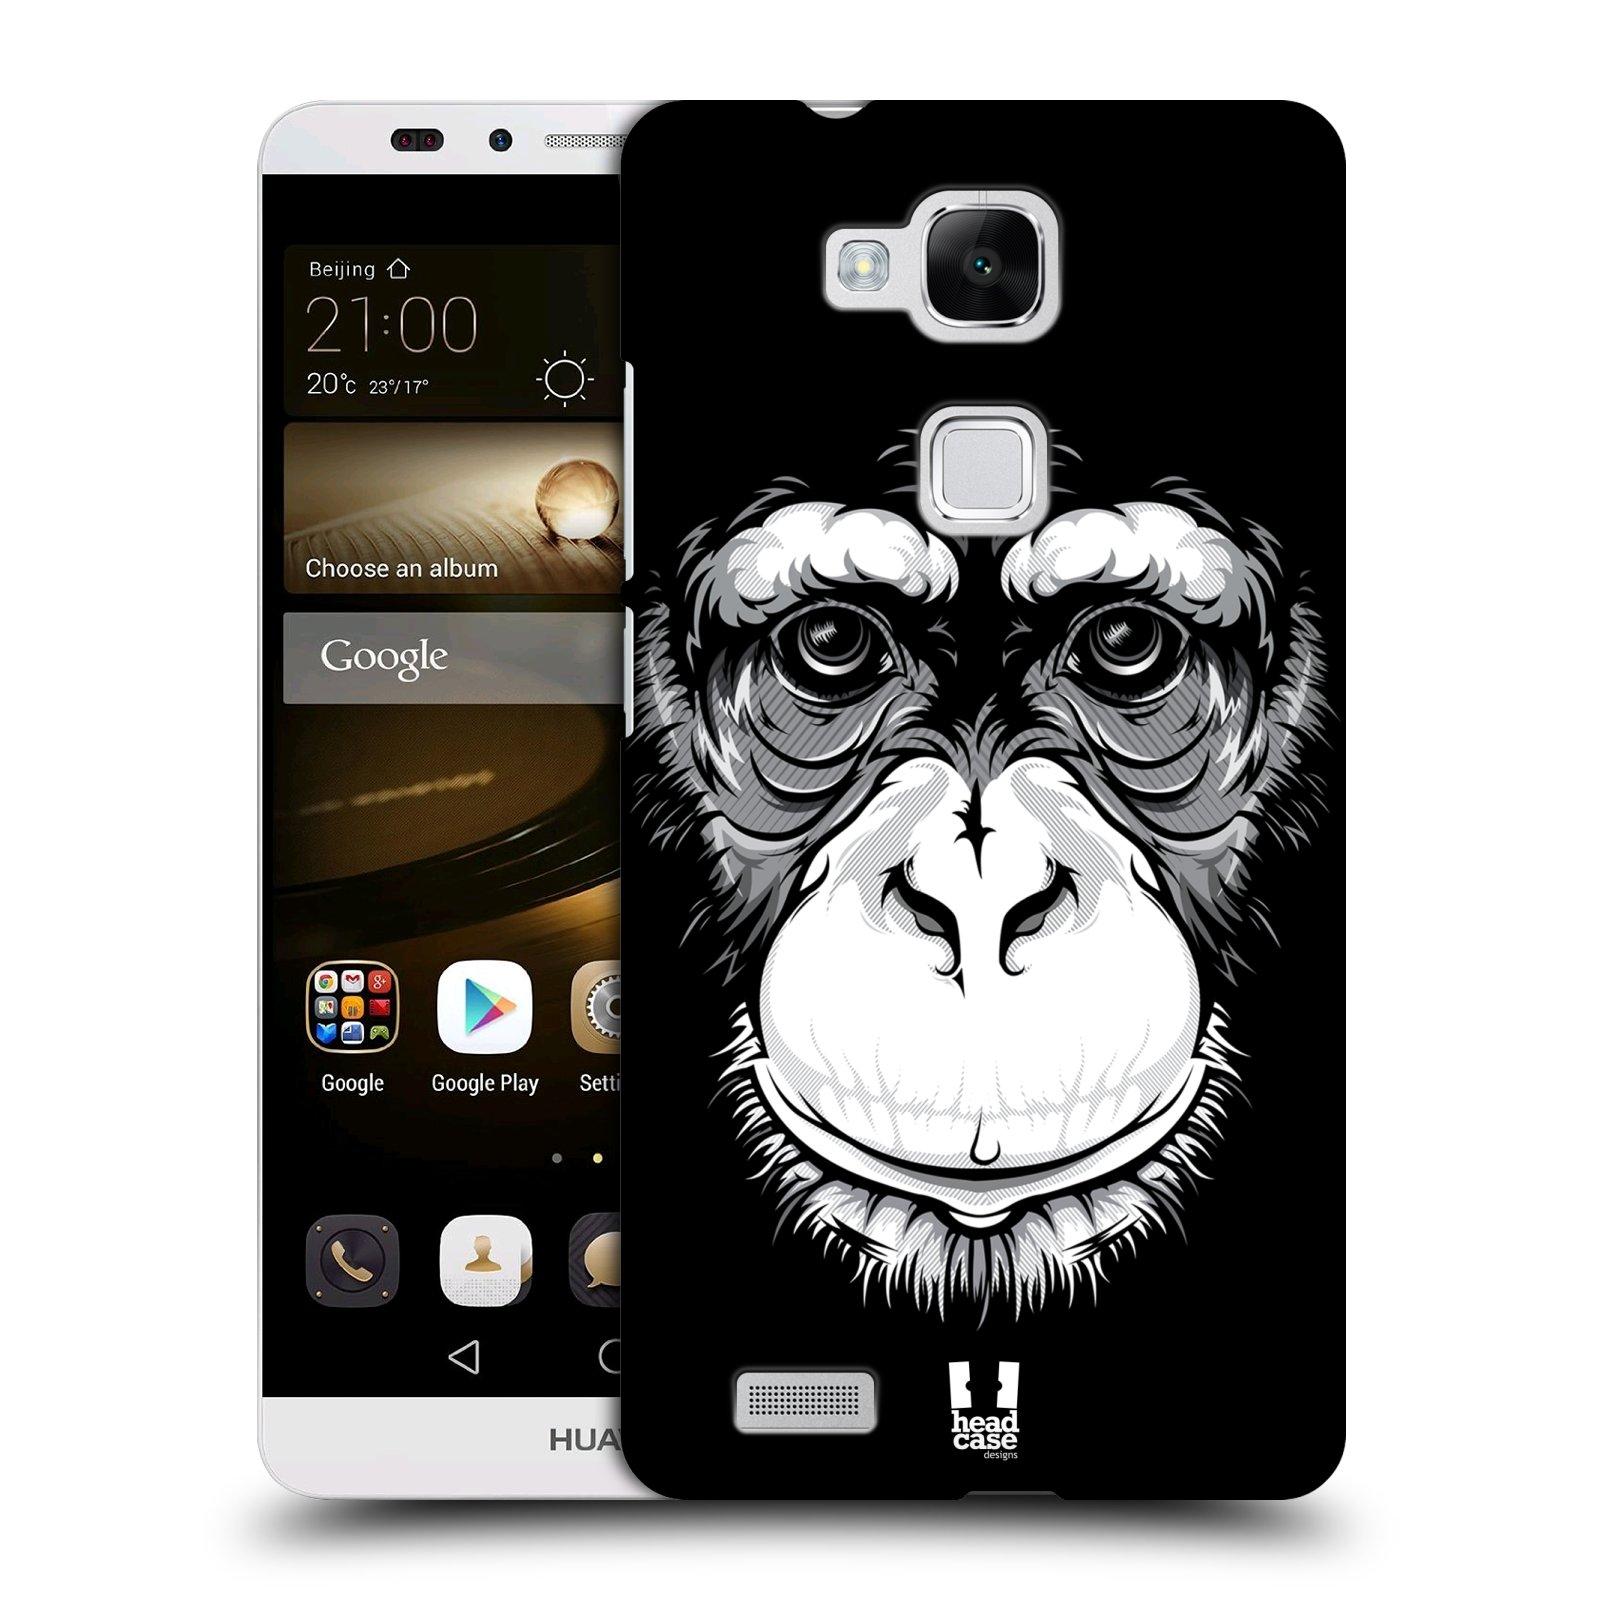 HEAD CASE plastový obal na mobil Huawei Mate 7 vzor Zvíře kreslená tvář šimpanz